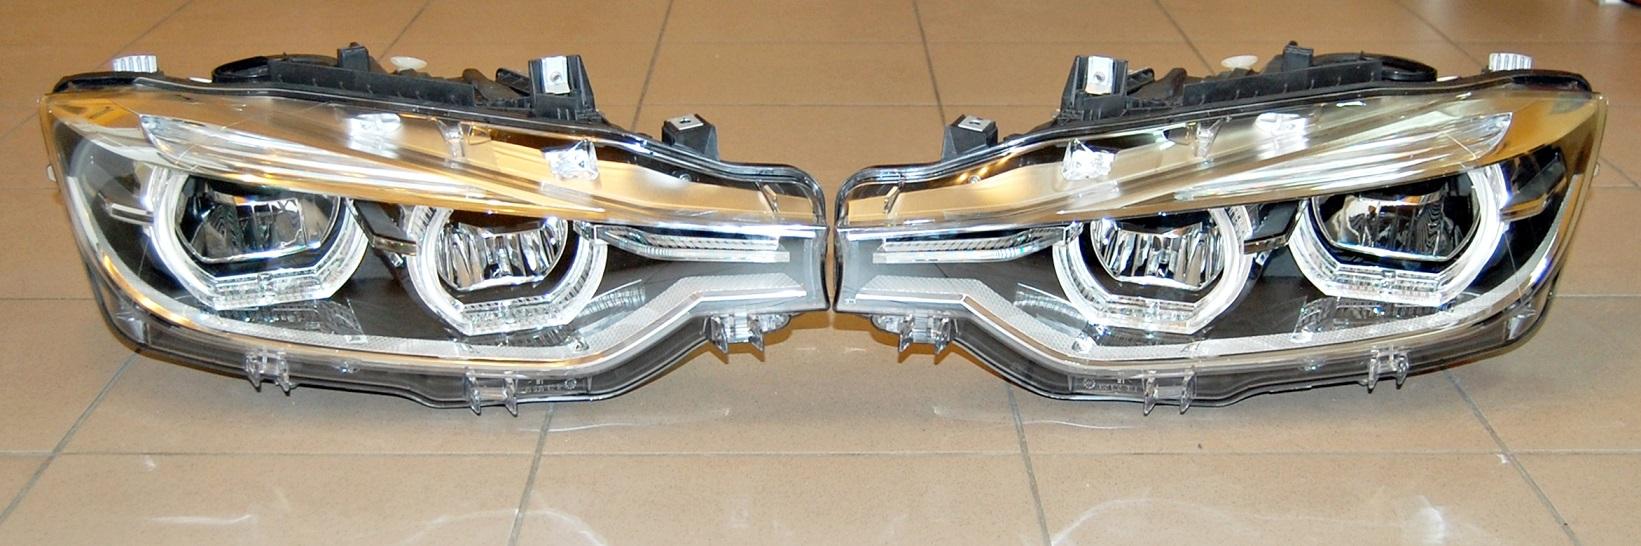 New Genuine Bmw F30 F31 Lci F35 Rhd Full Led Headlights